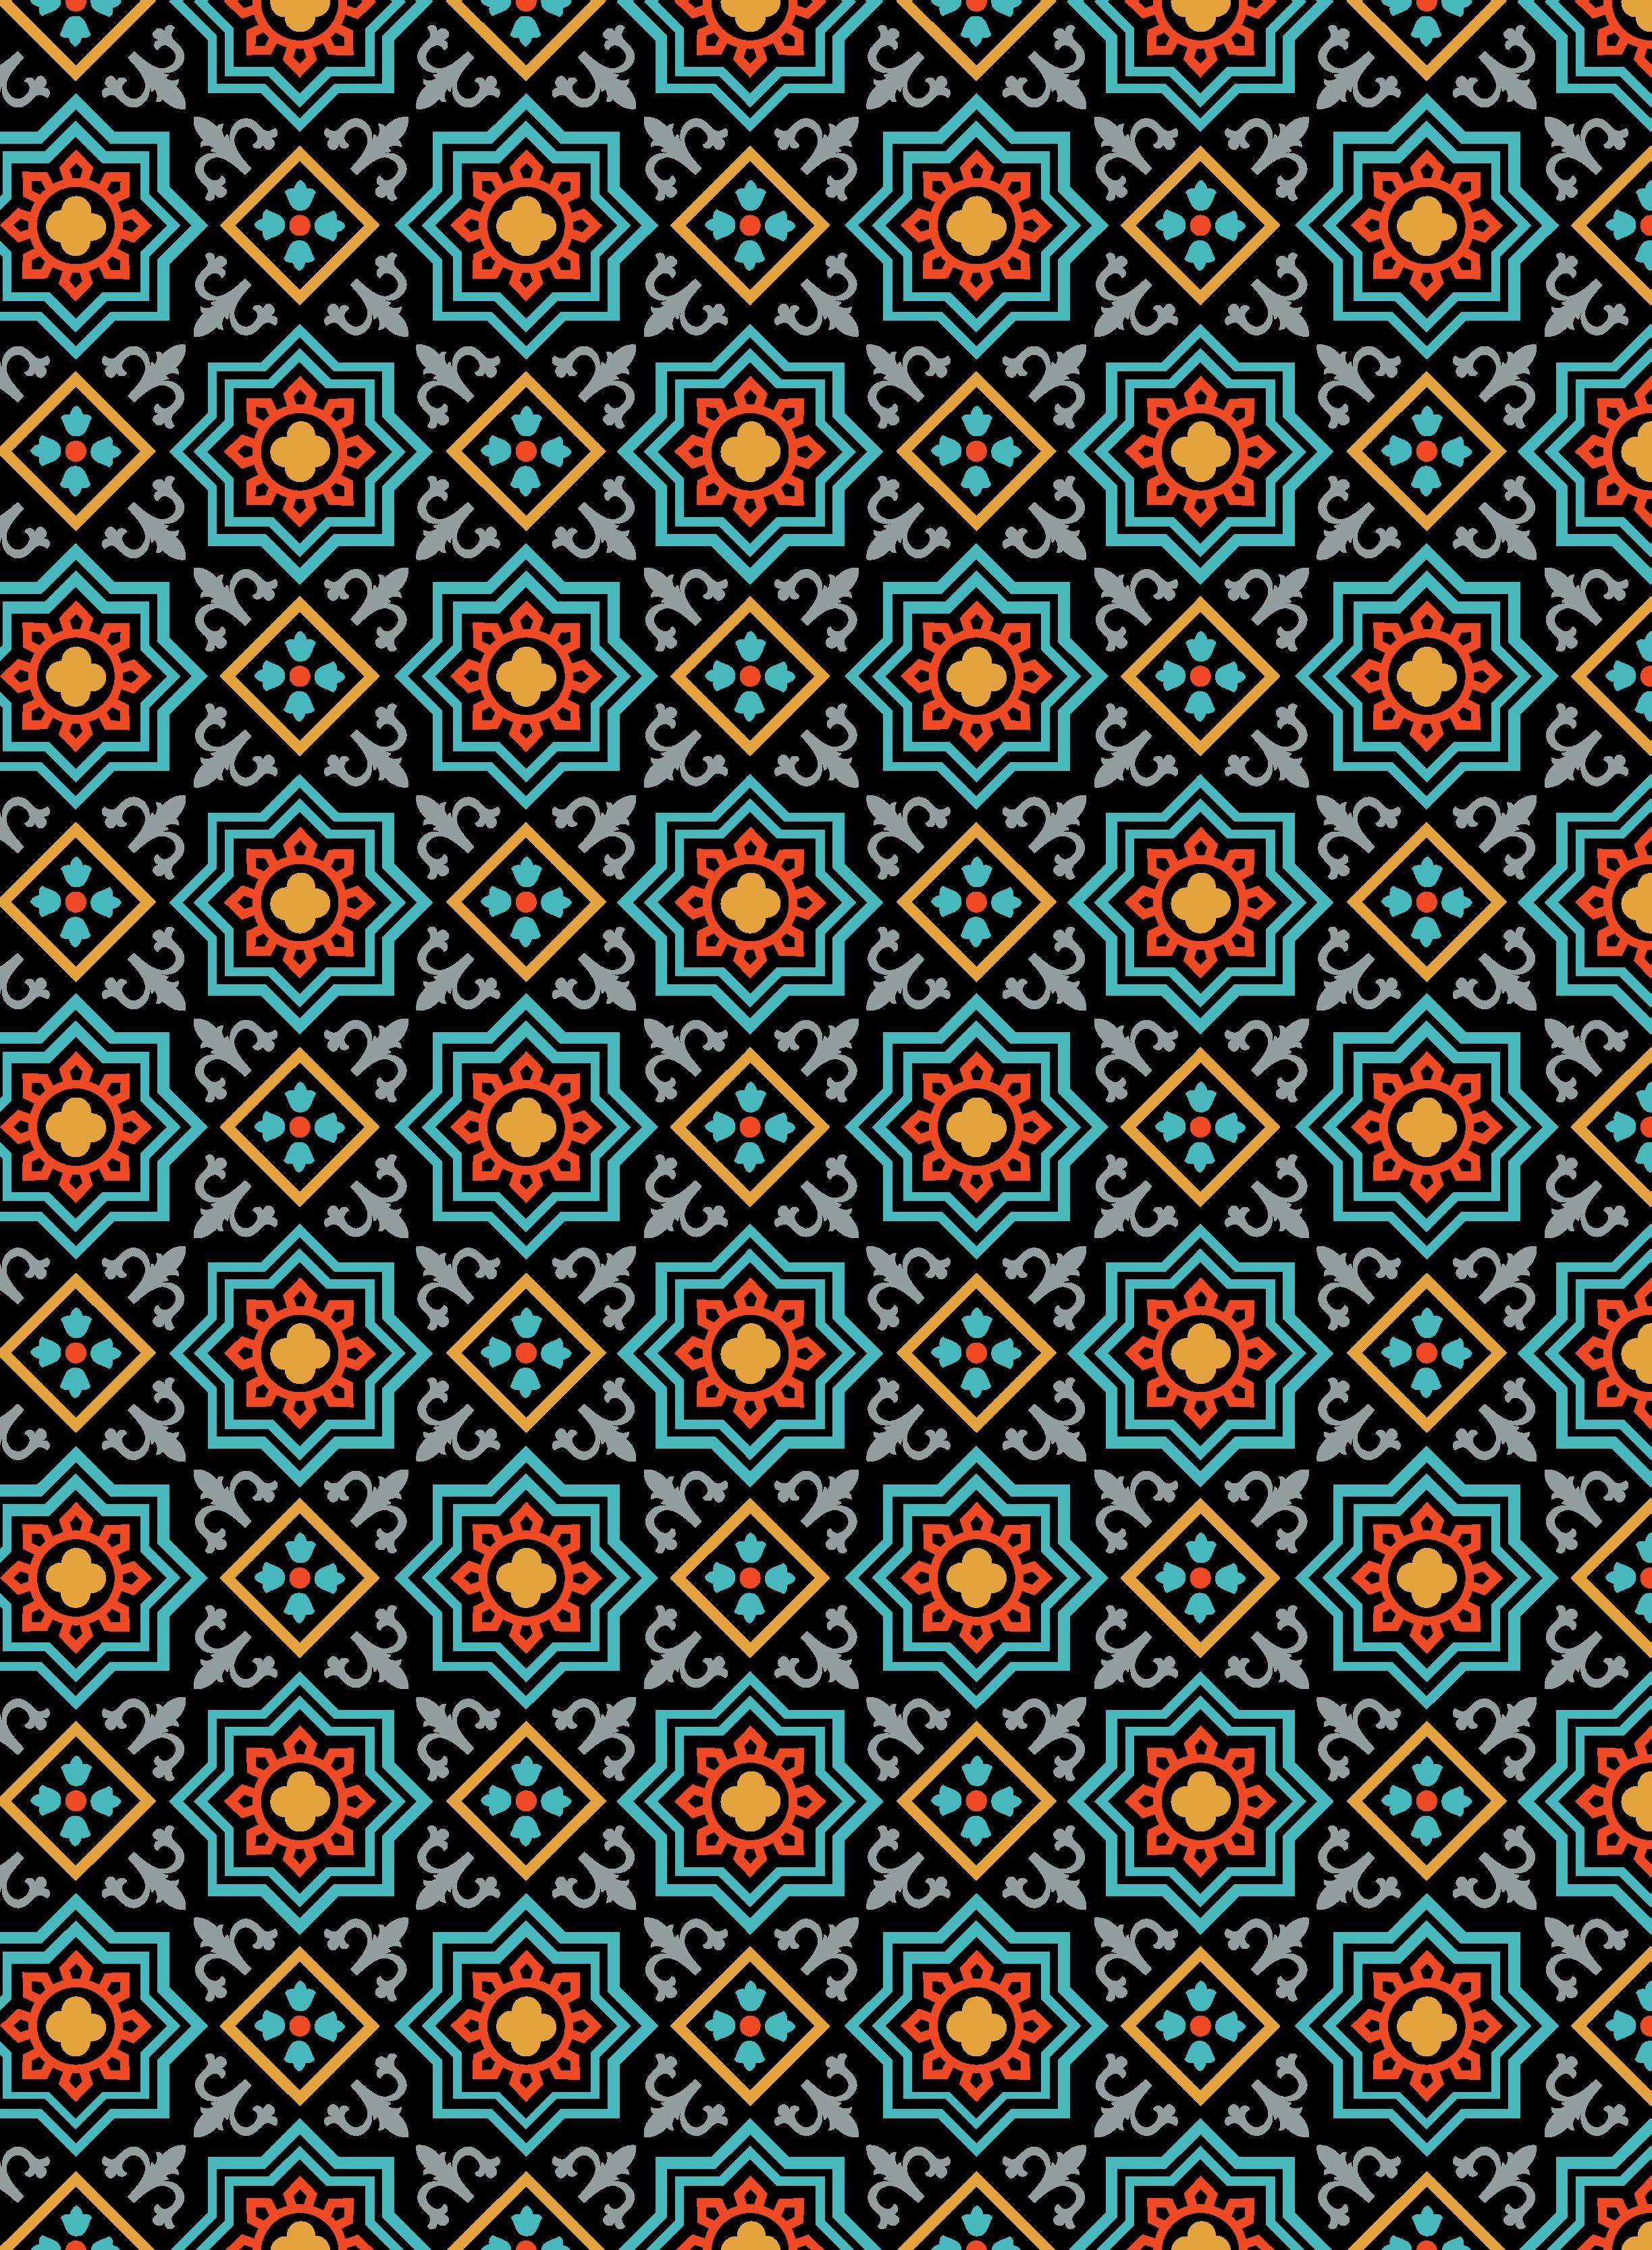 Background Batik Islami : background, batik, islami, Http://c.top4top.net/p_178oxw31.png, Islamic, Patterns,, Pattern,, Ramadan, Decorations